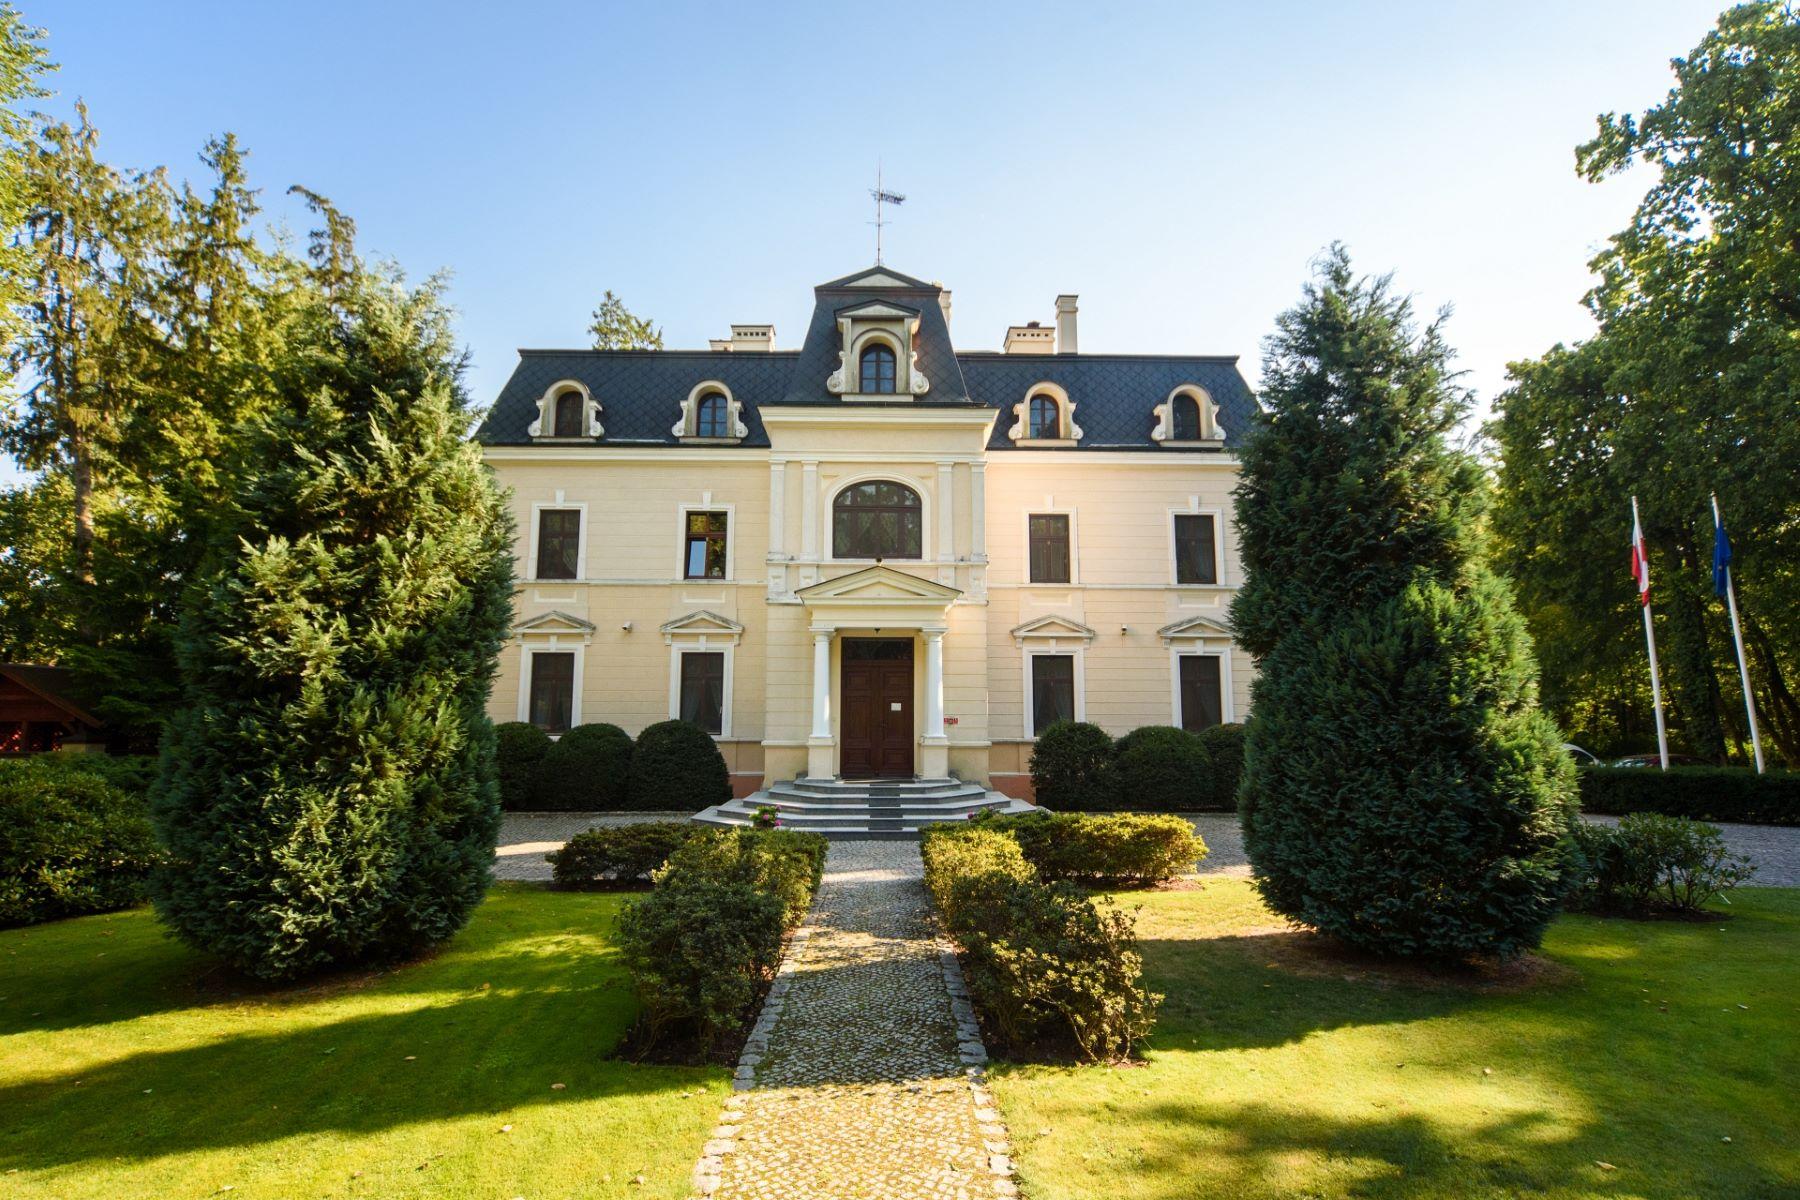 Single Family Homes για την Πώληση στο Other Poland, Αλλεσ Περιοχεσ Στην Πολωνια Πολωνια